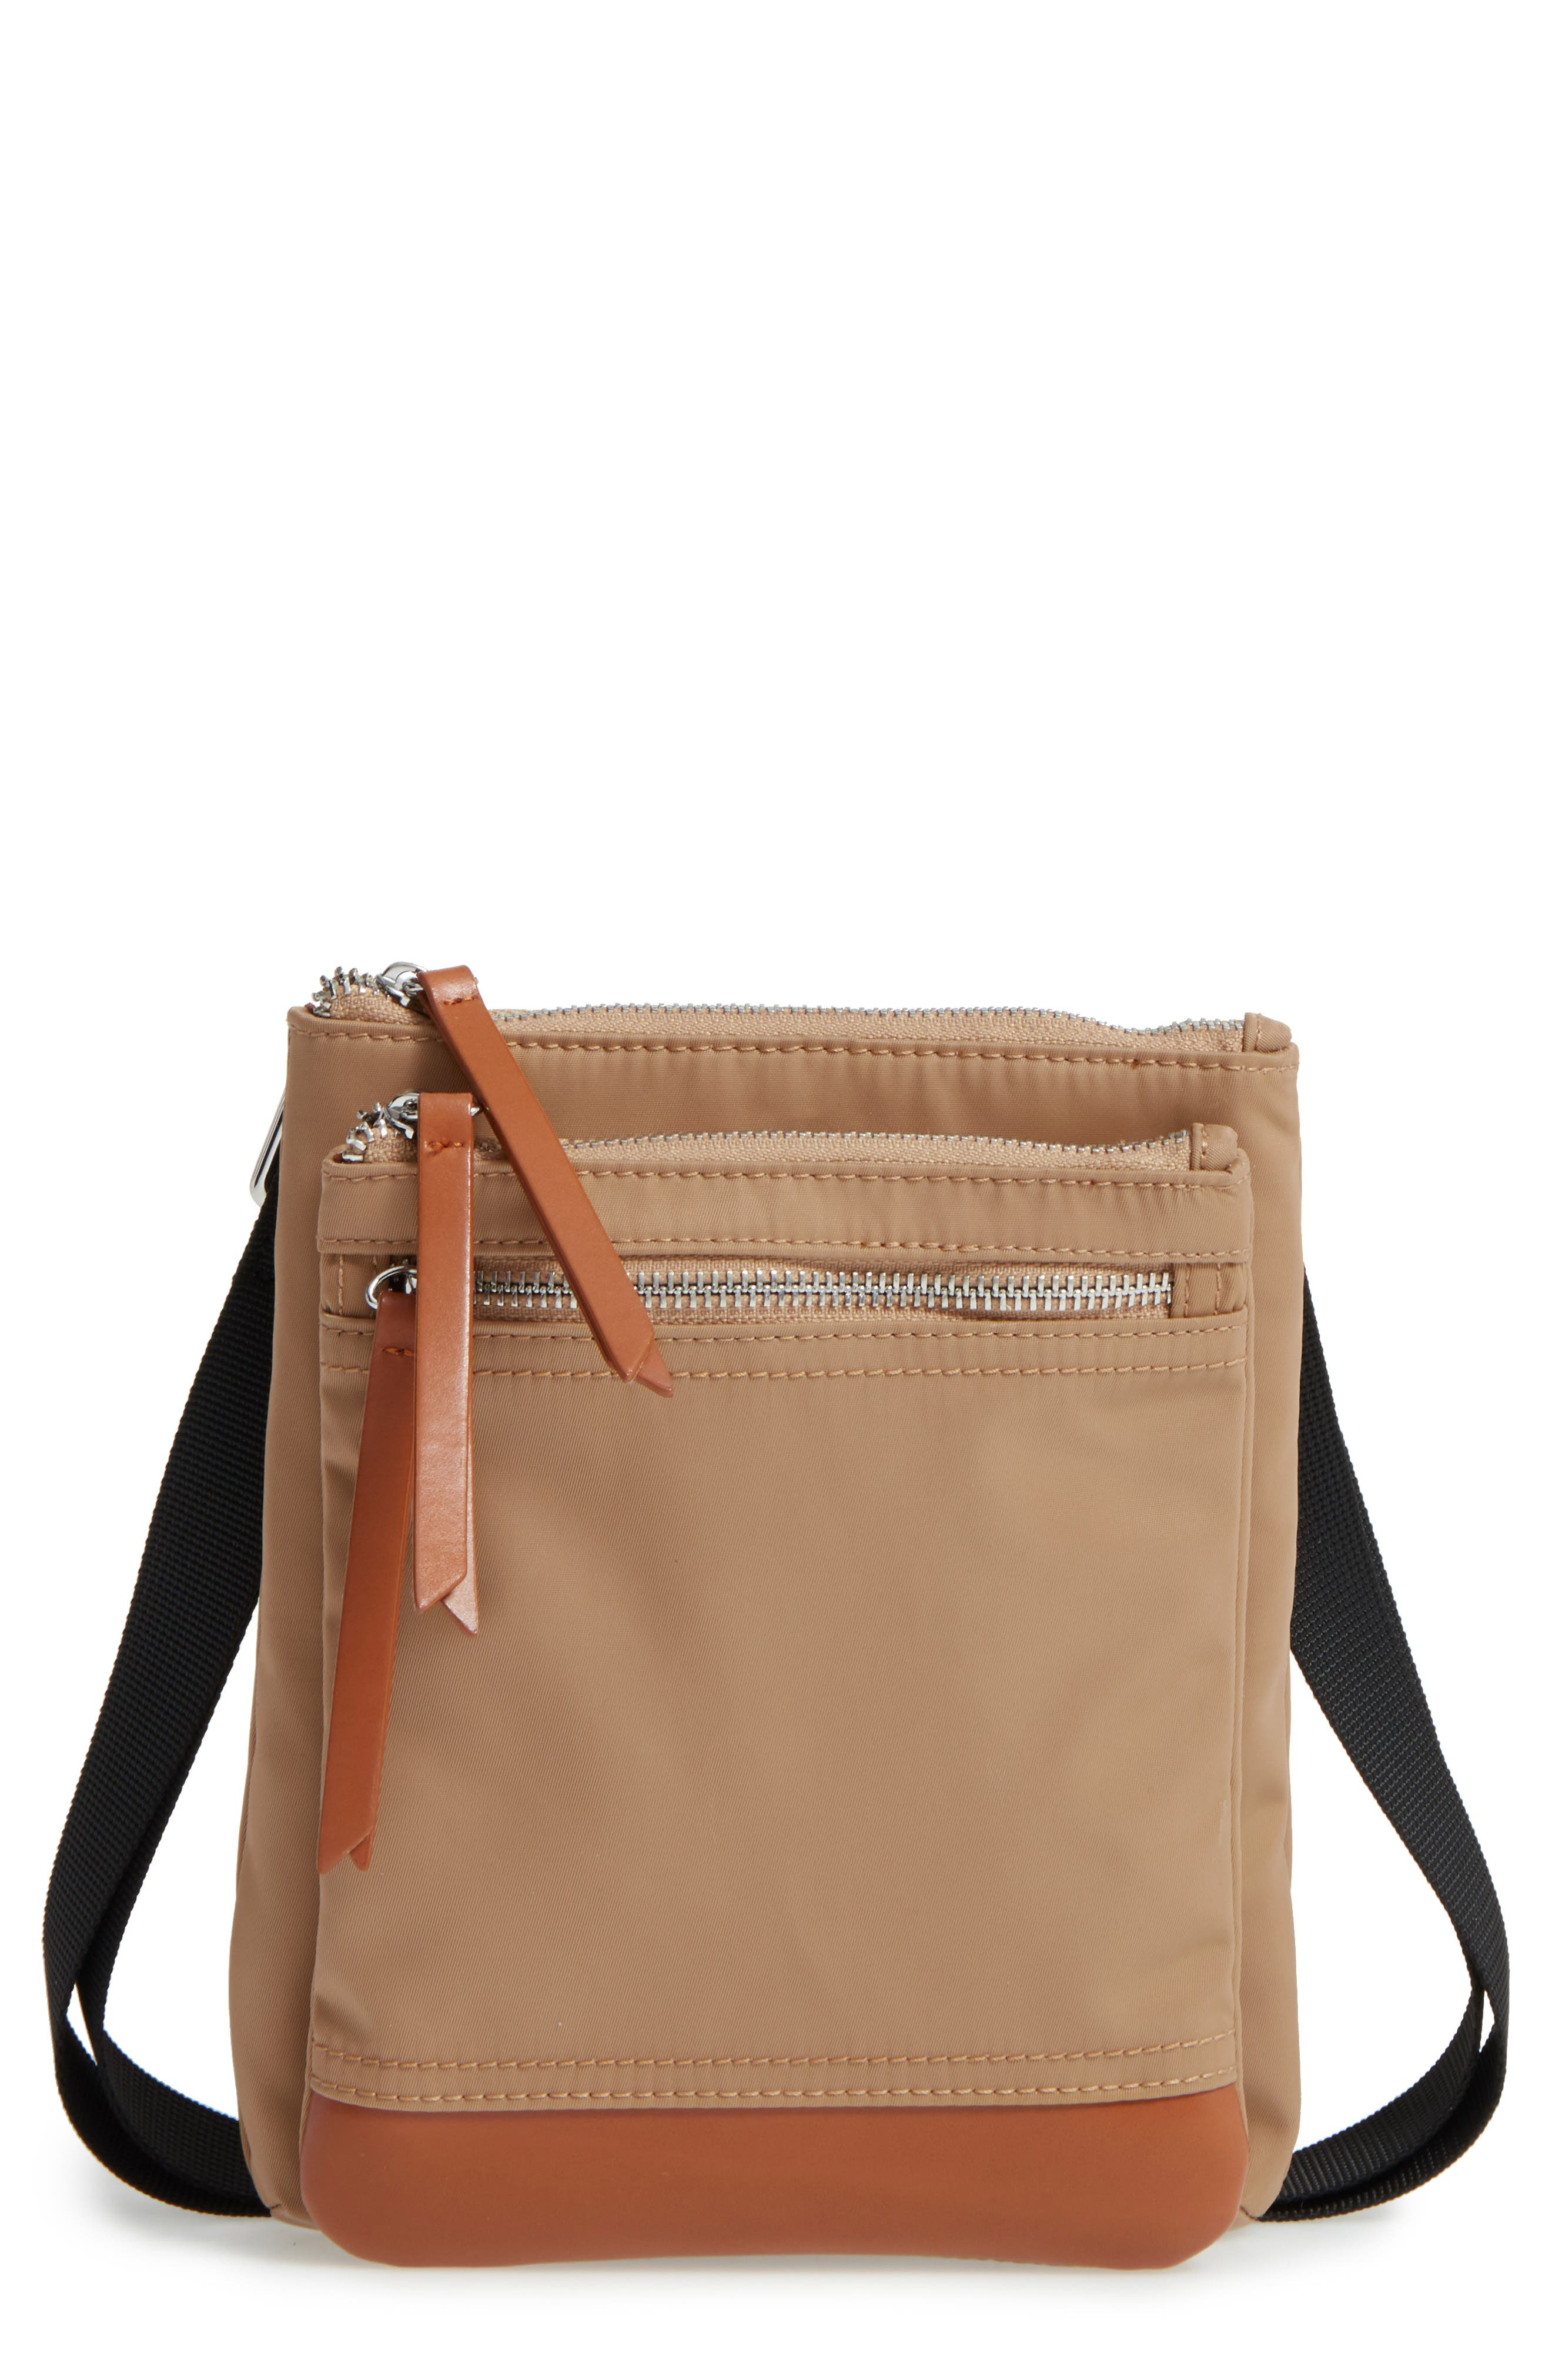 LODIS Los Angeles Zora RFID Nylon & Leather Crossbody Bag